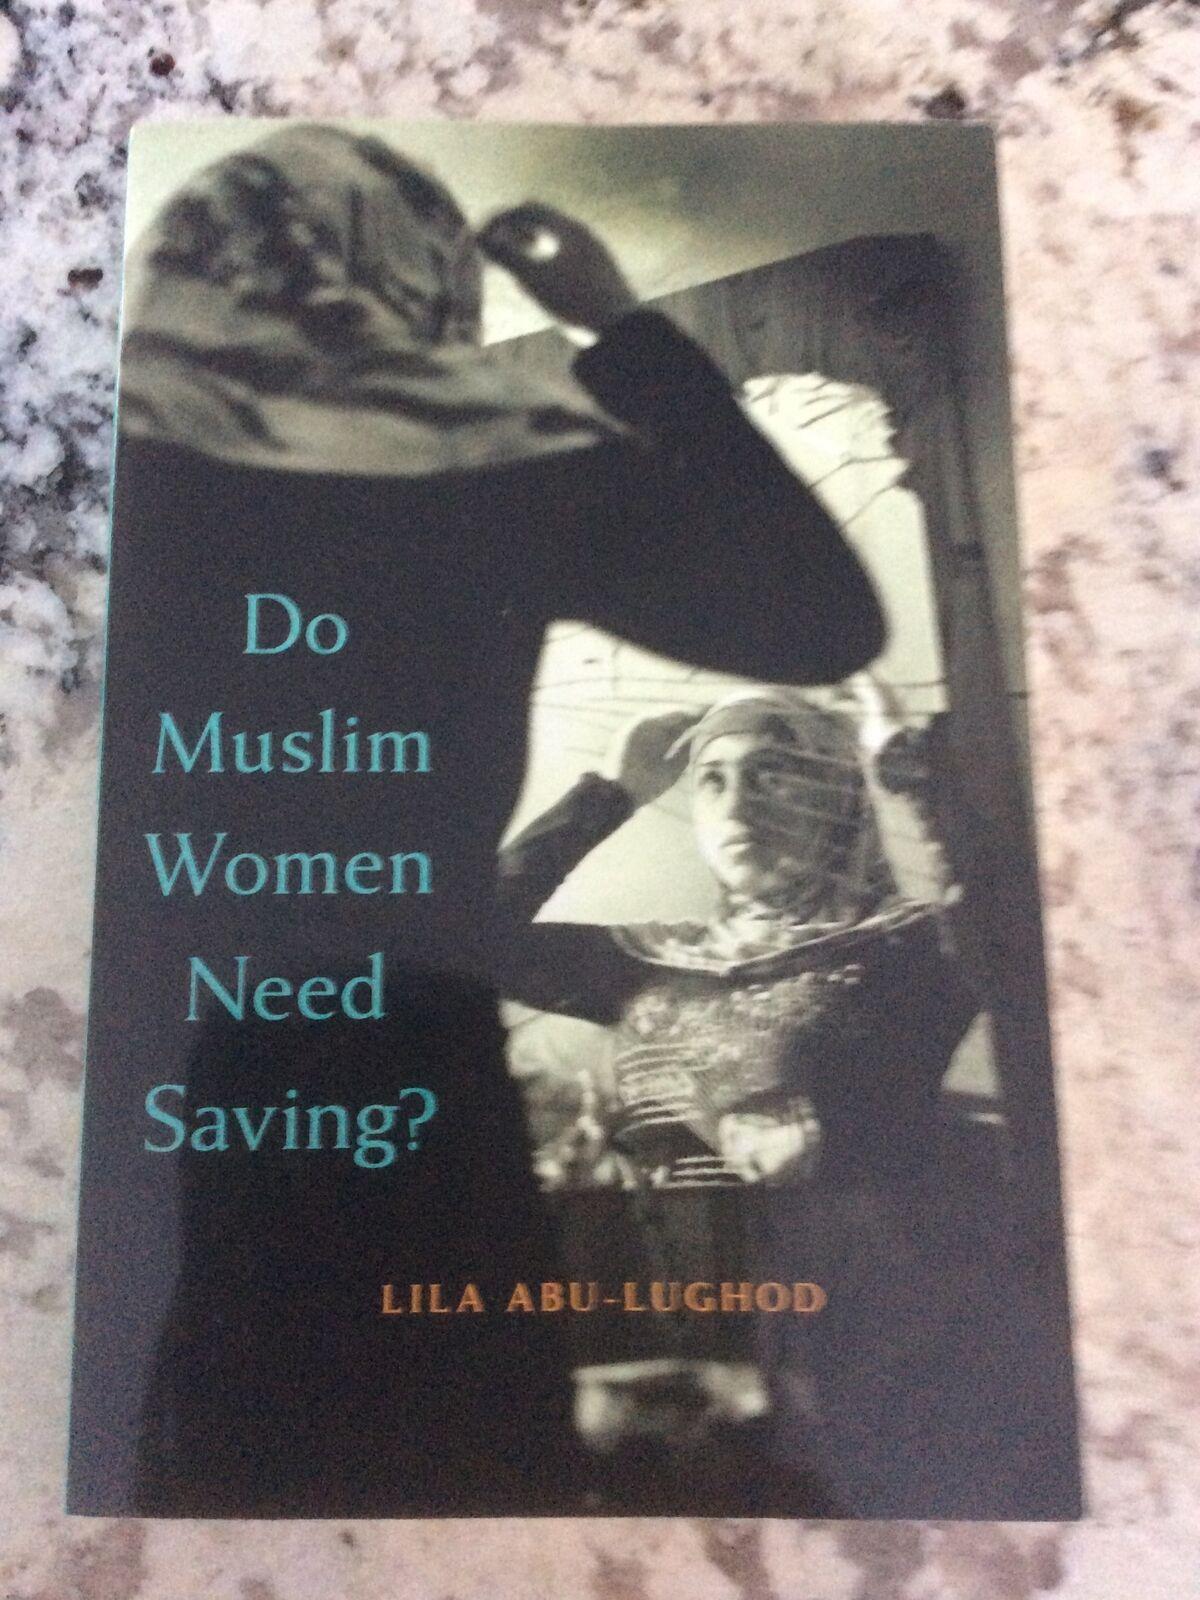 Do Muslim Women Need Saving by Lila Abu Lughod 12, Trade Paperback